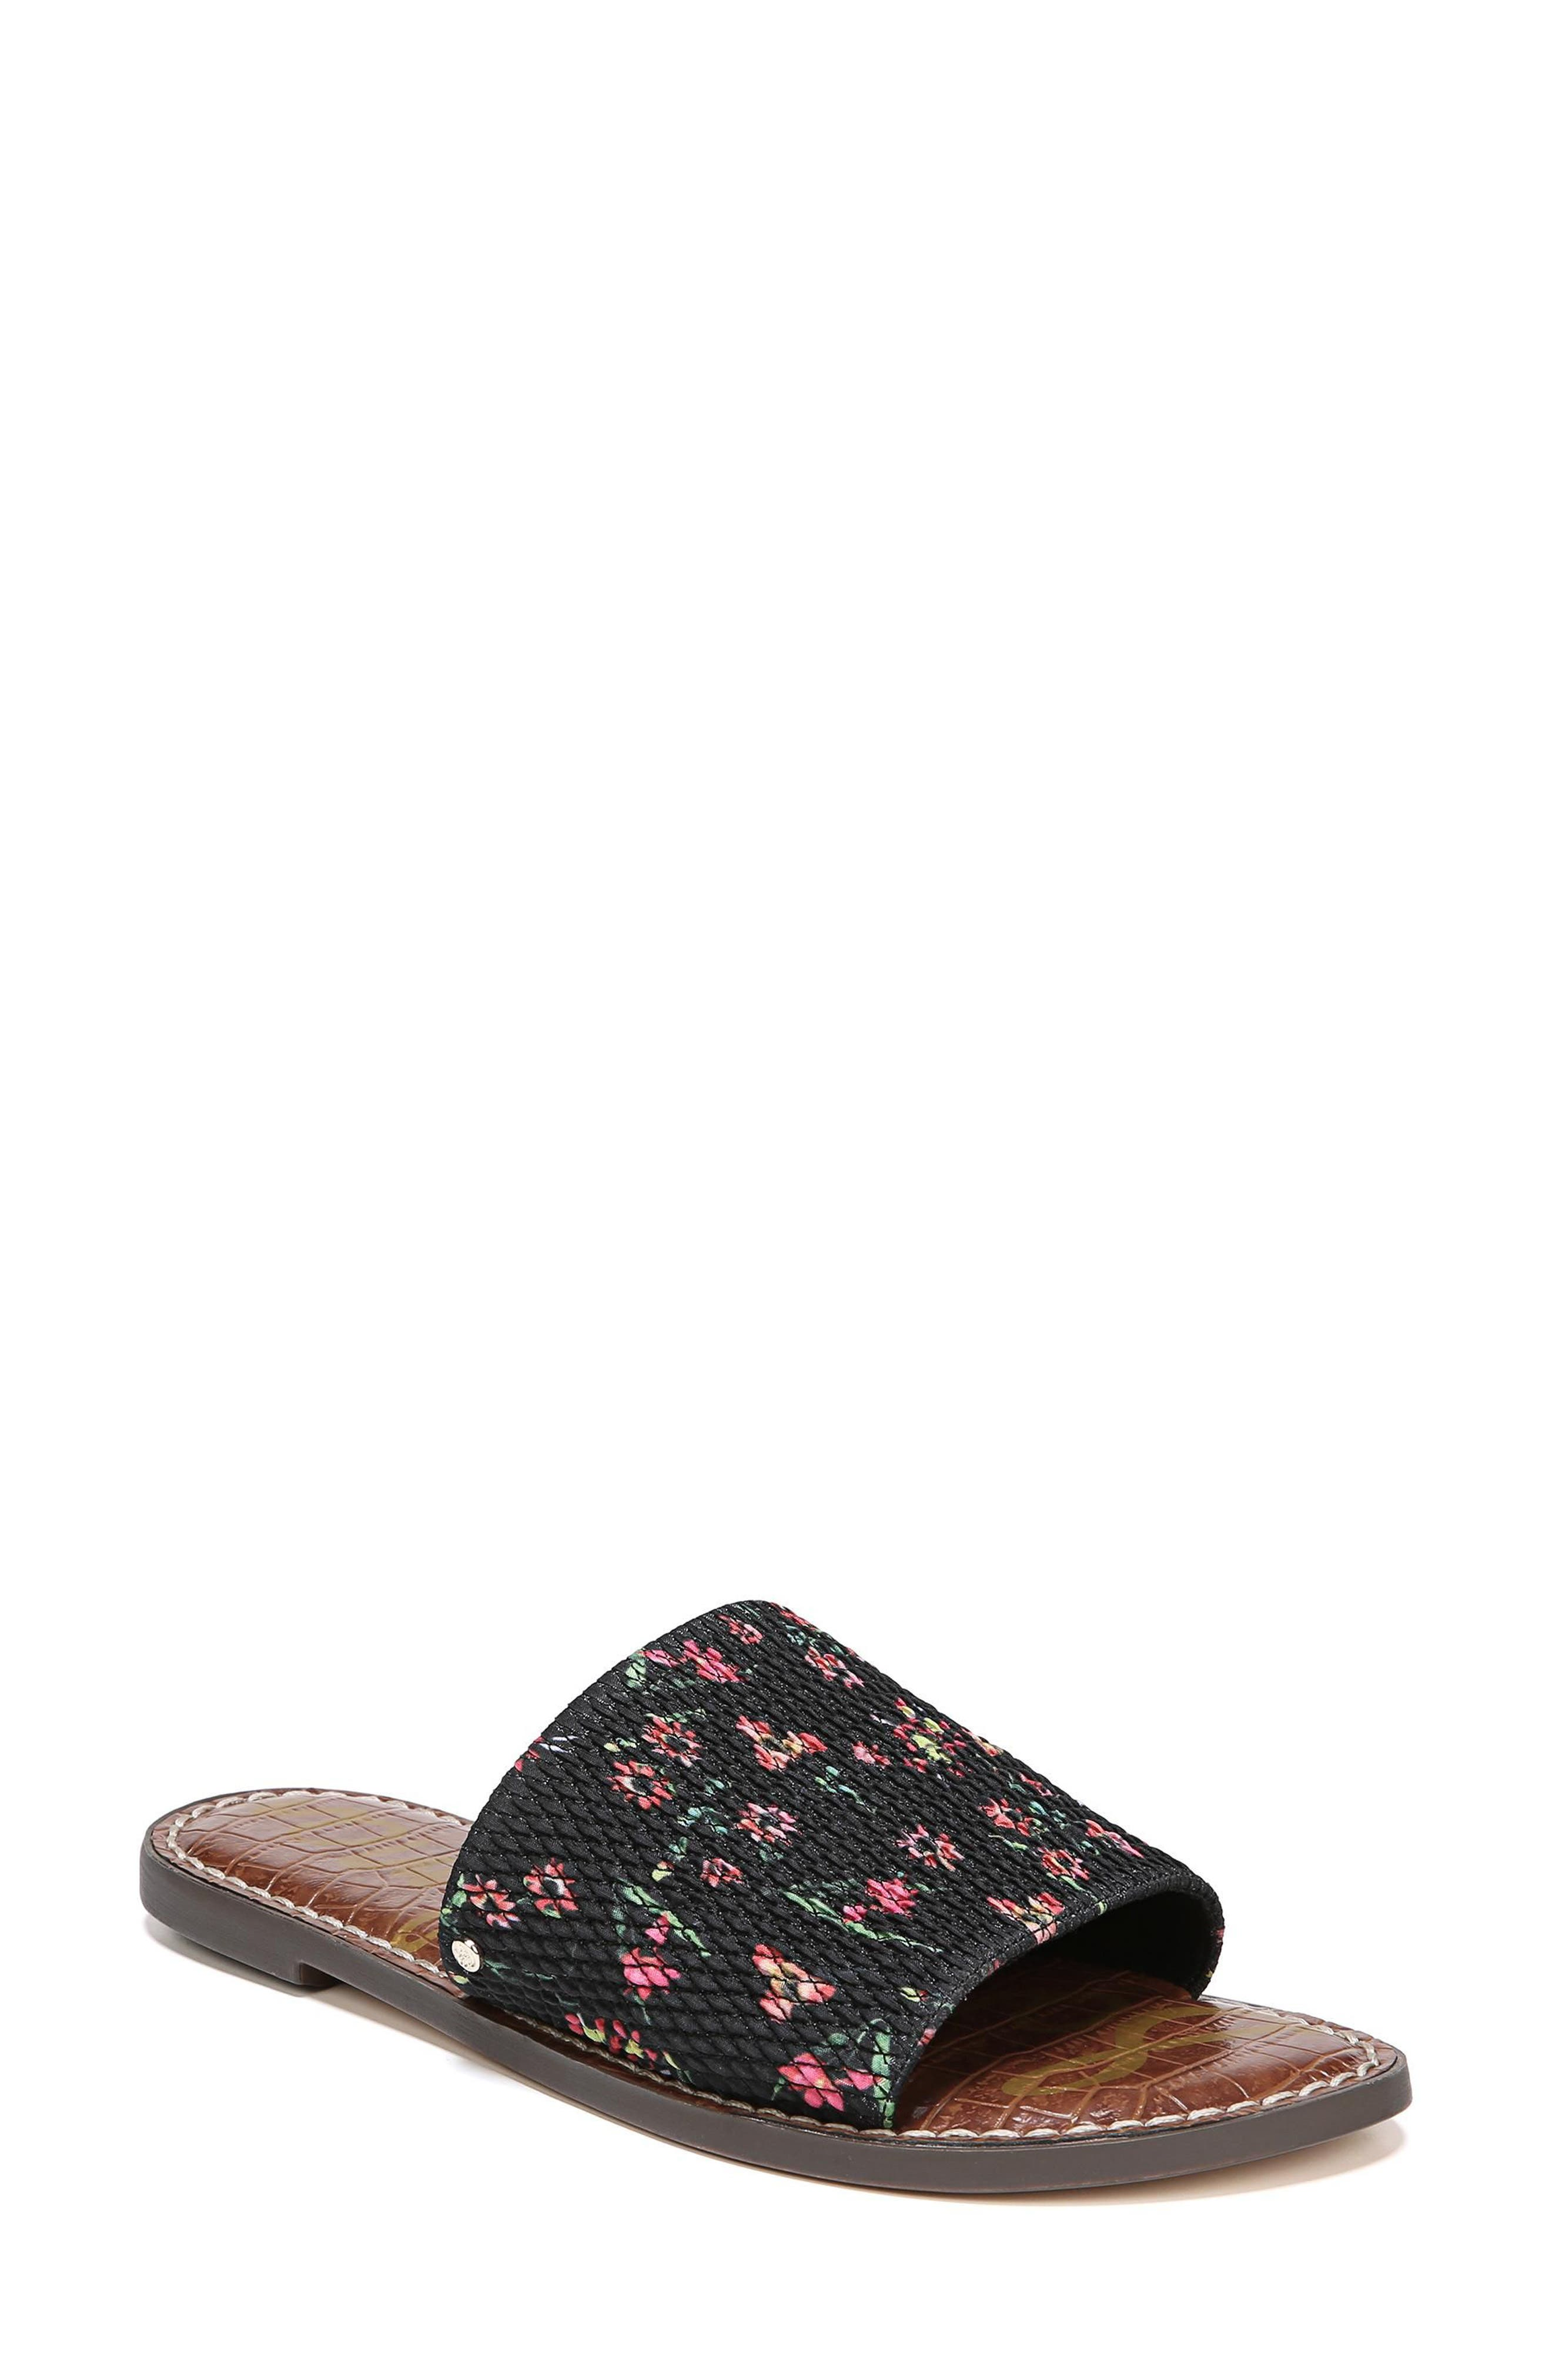 Gio Slide Sandal,                         Main,                         color, 001